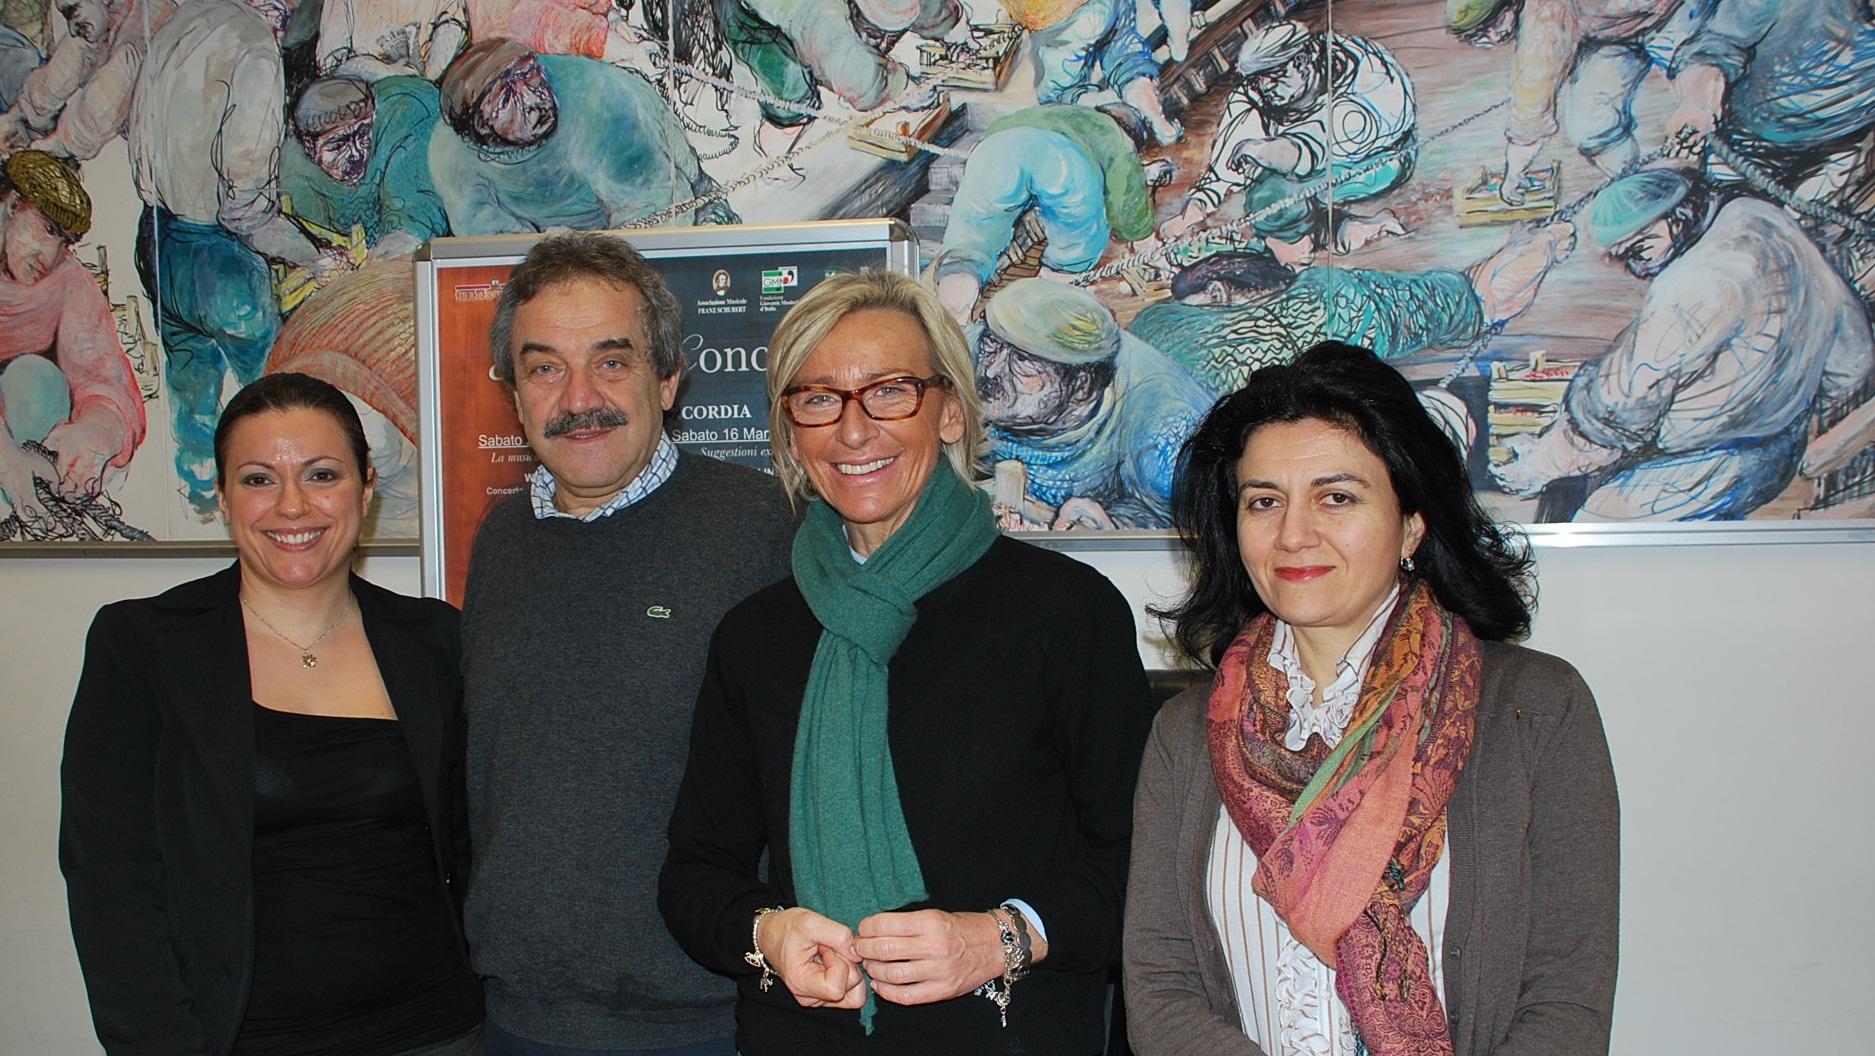 Margerita Sorge, Rita Virgili, Giampiero Paoletti